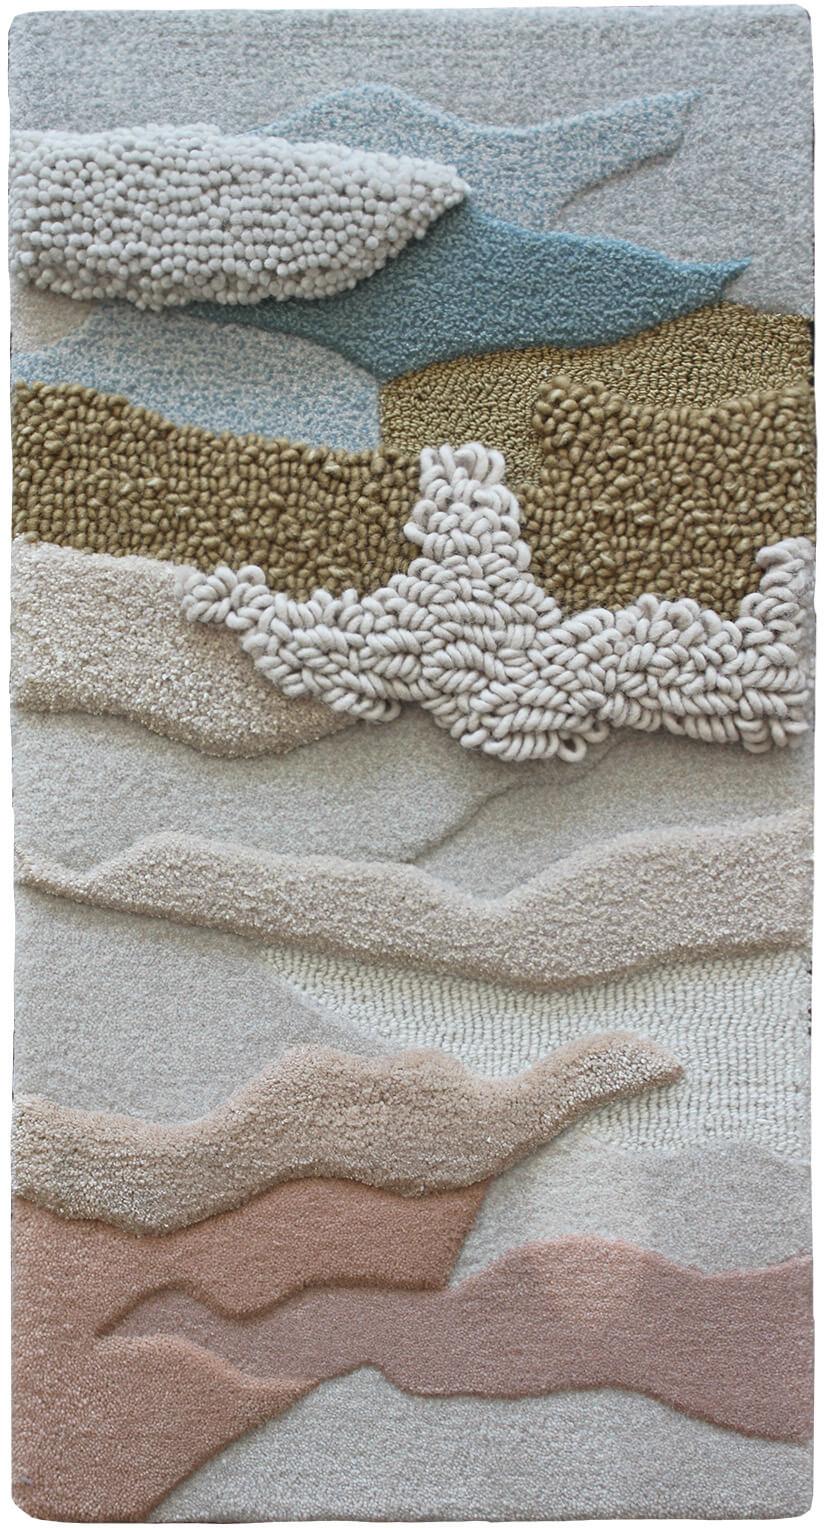 STRALIS COOLABAH MOROCCO - TSAR Carpets: The Ultimate Custom Carpet & Rug Solution